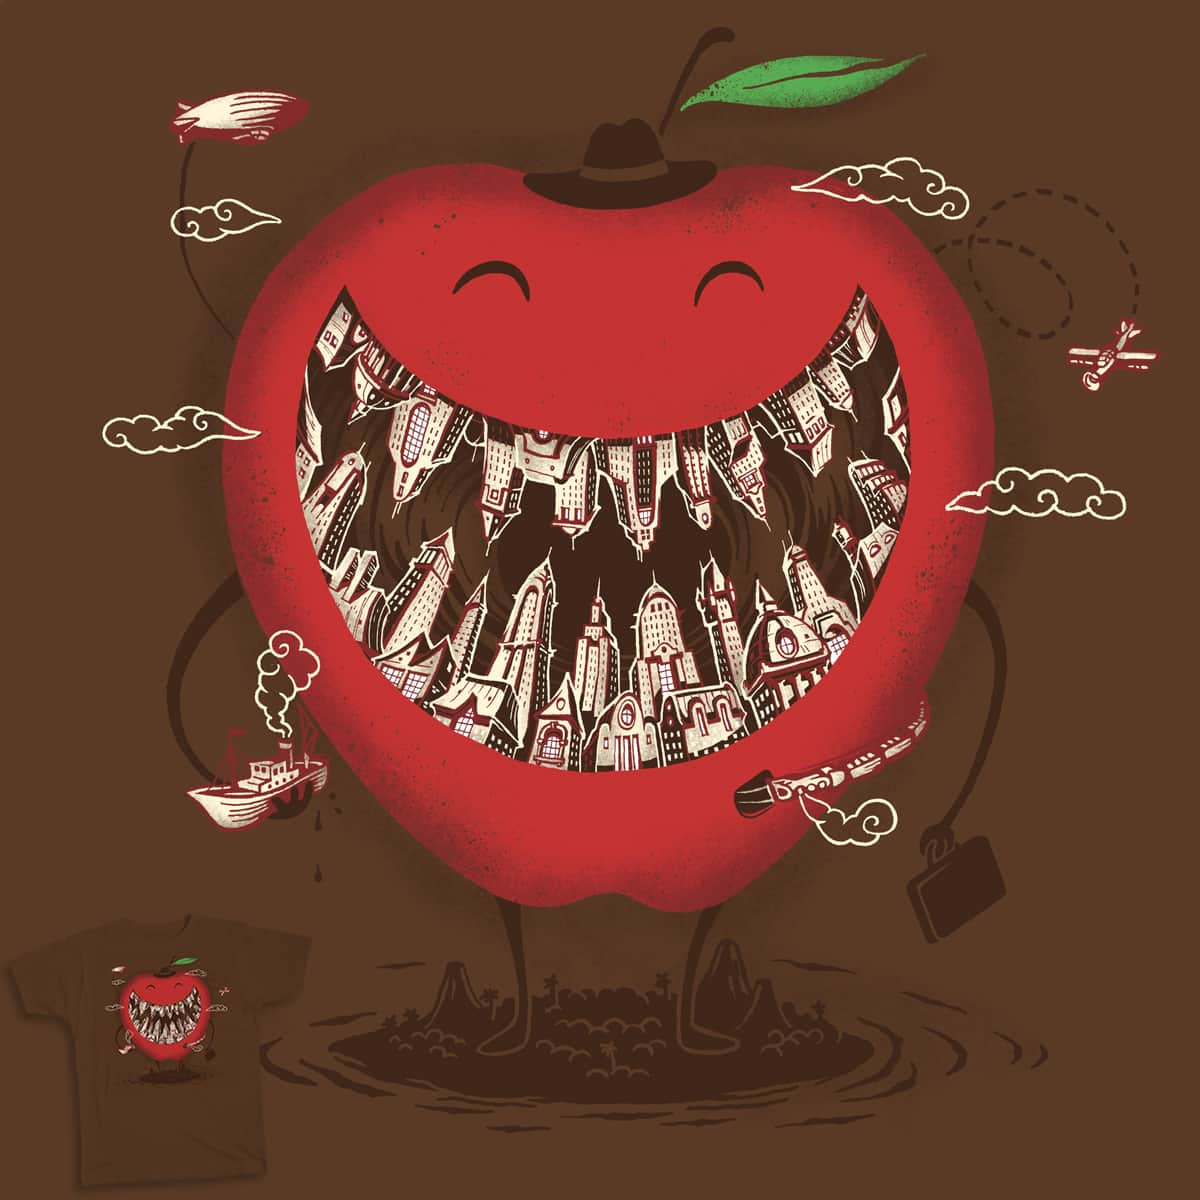 The BIG Apple! by alternik  on Threadless